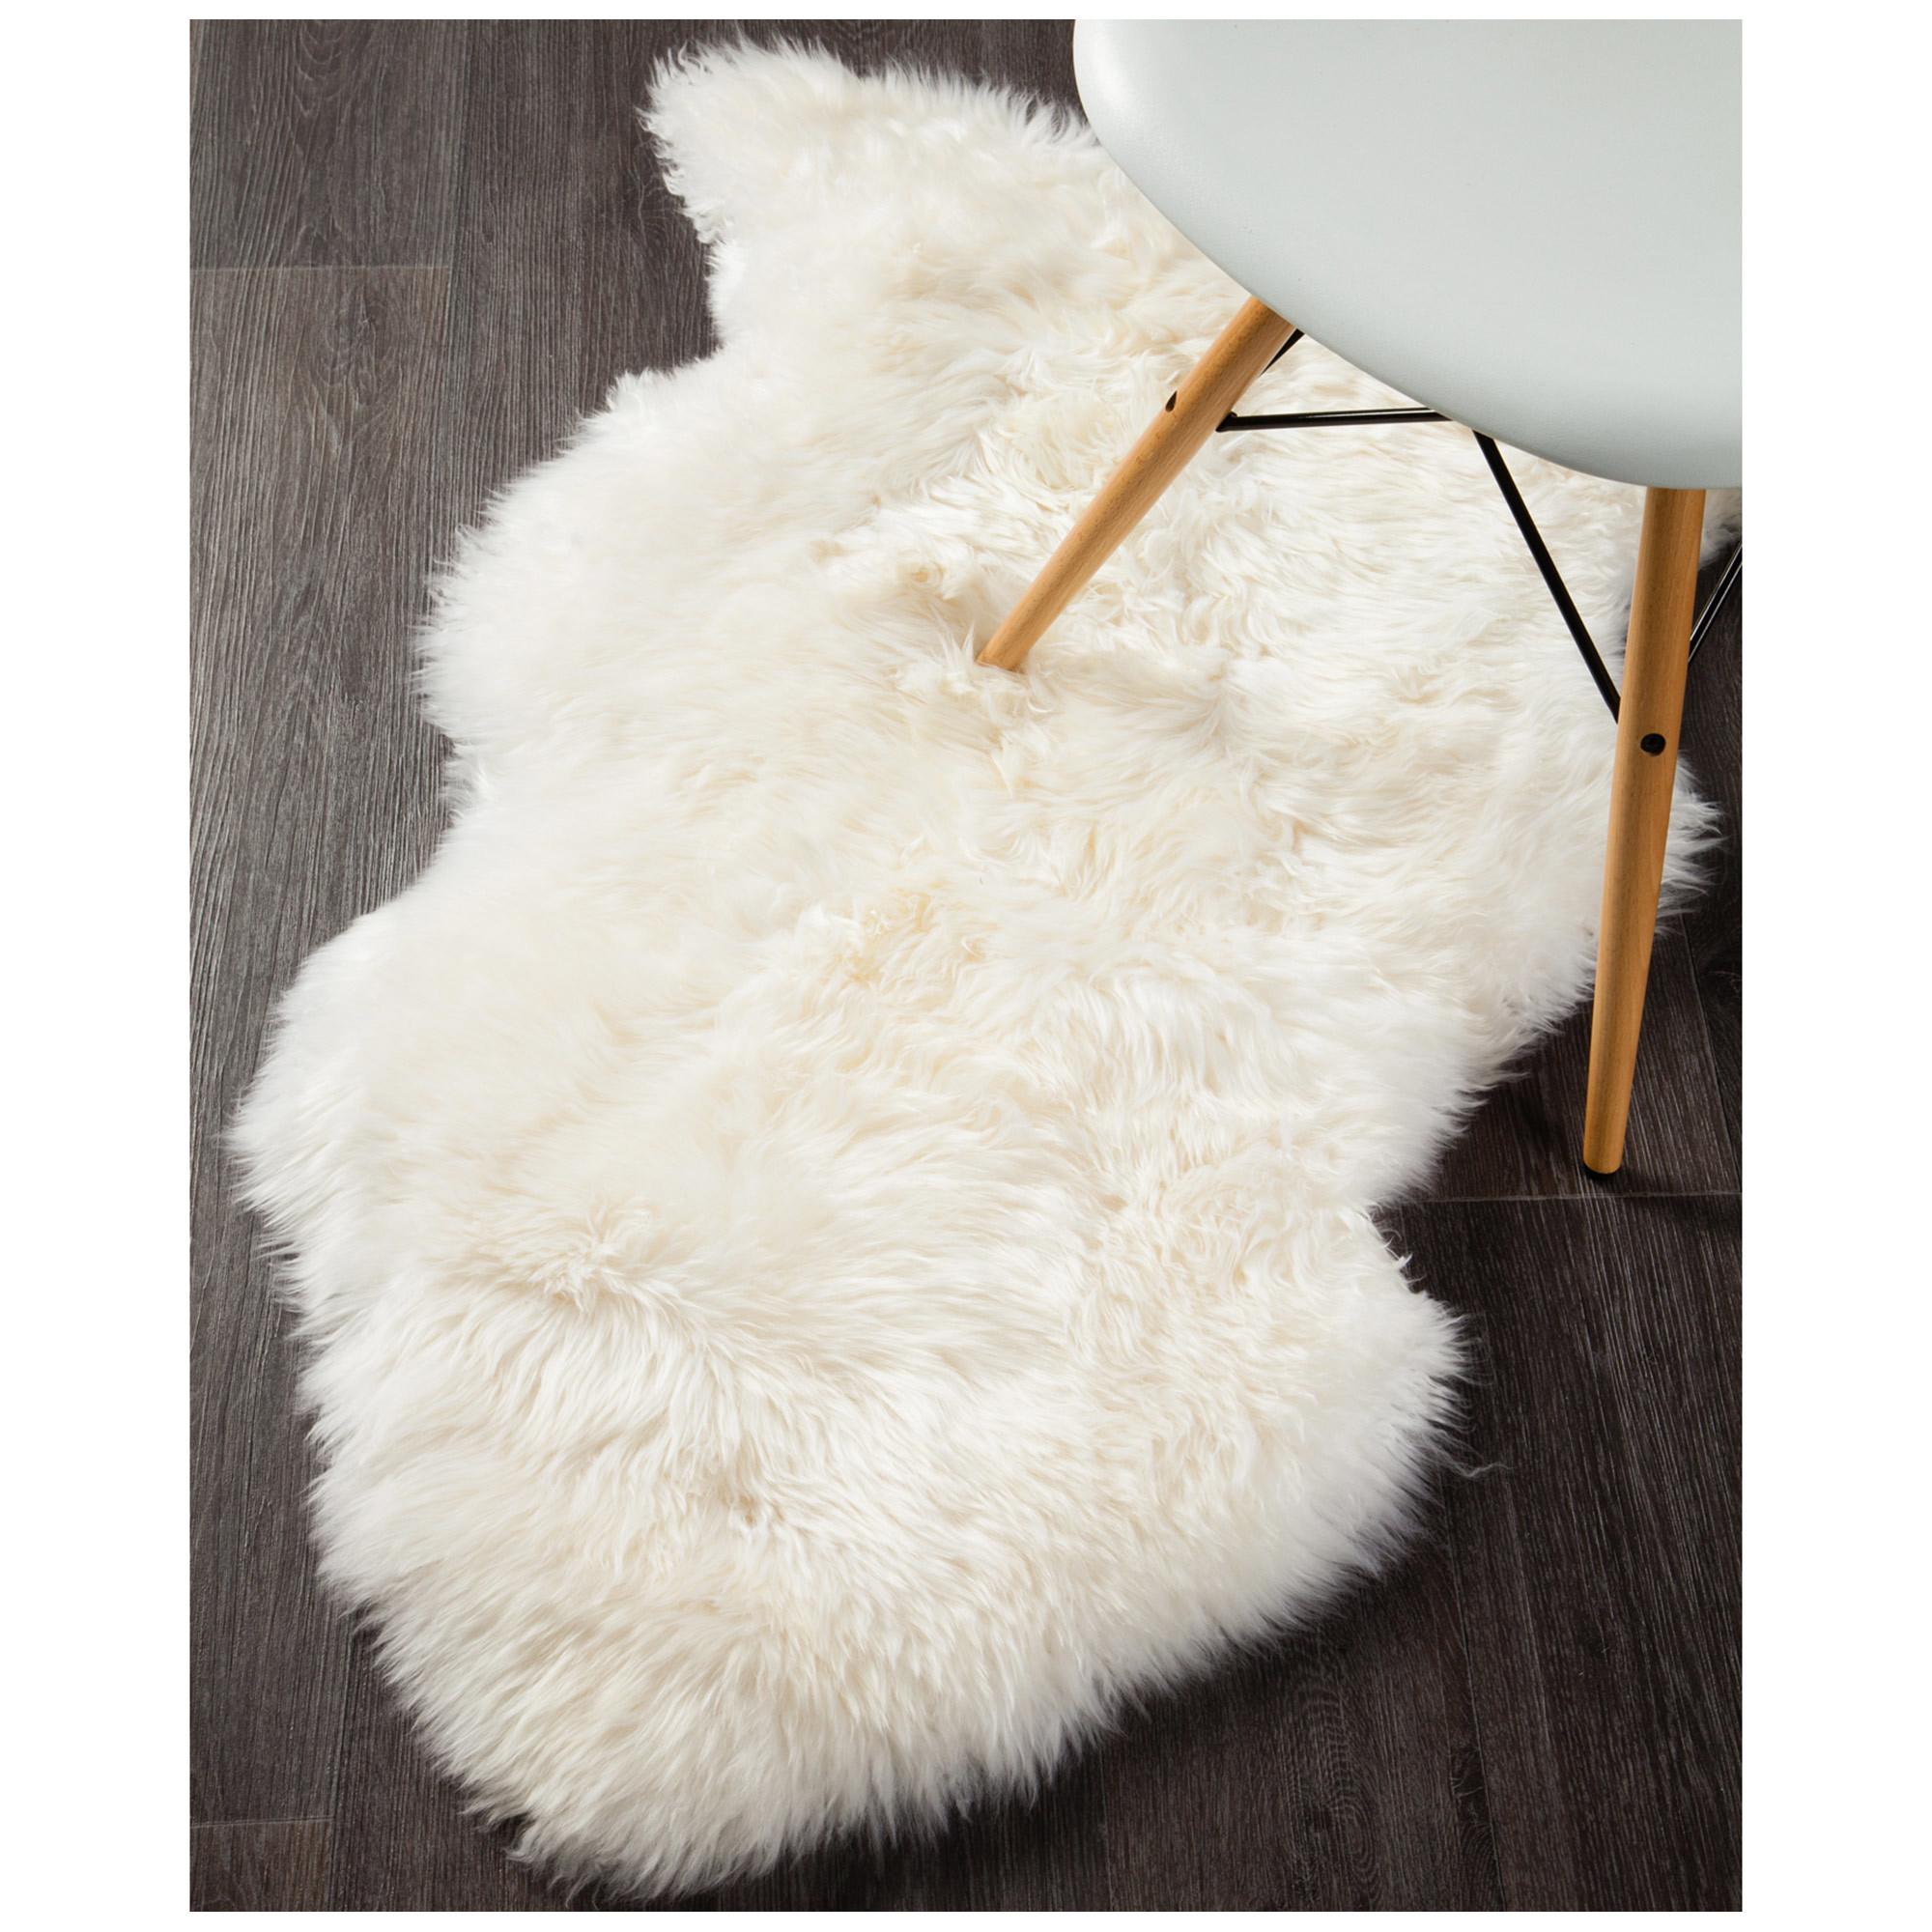 instructions medium only now buy x care clean sheep habitat sheepskin cream skin dry rug large uk at